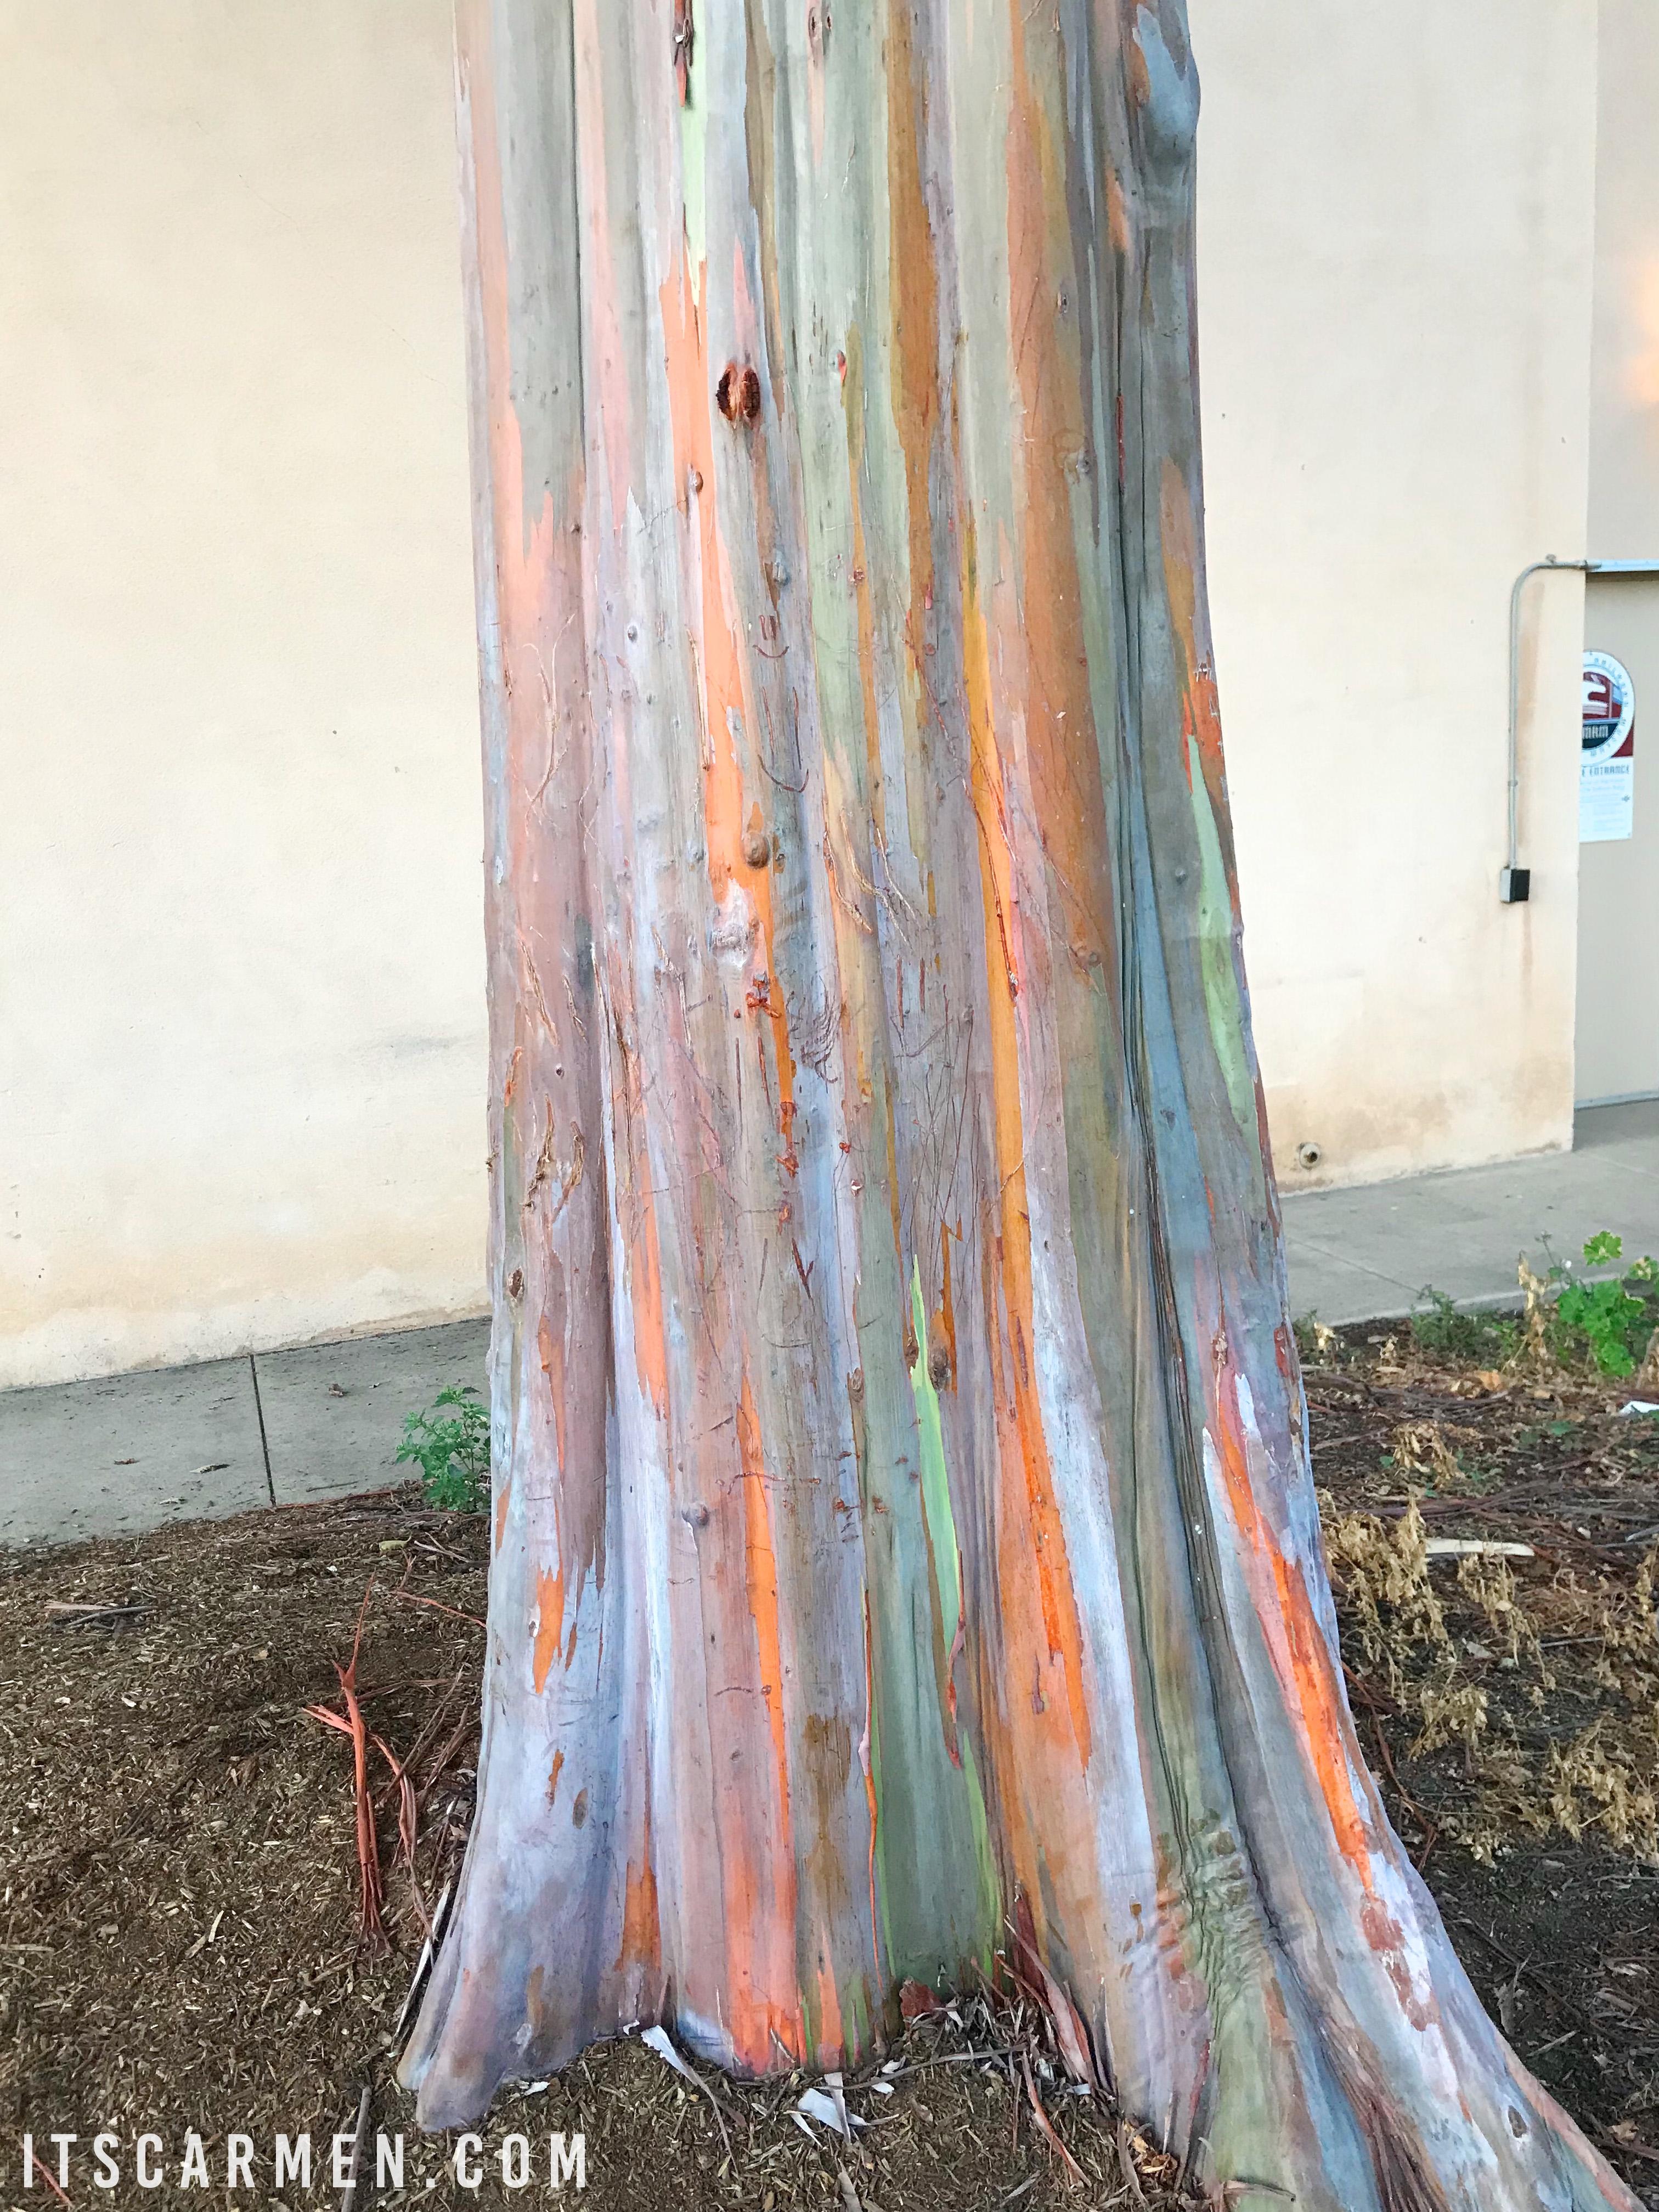 Rainbow Eucalyptus Tree In Balboa Park San Diego Carmen Varner Travel Influencer Blogging Coach Social Media Consultant